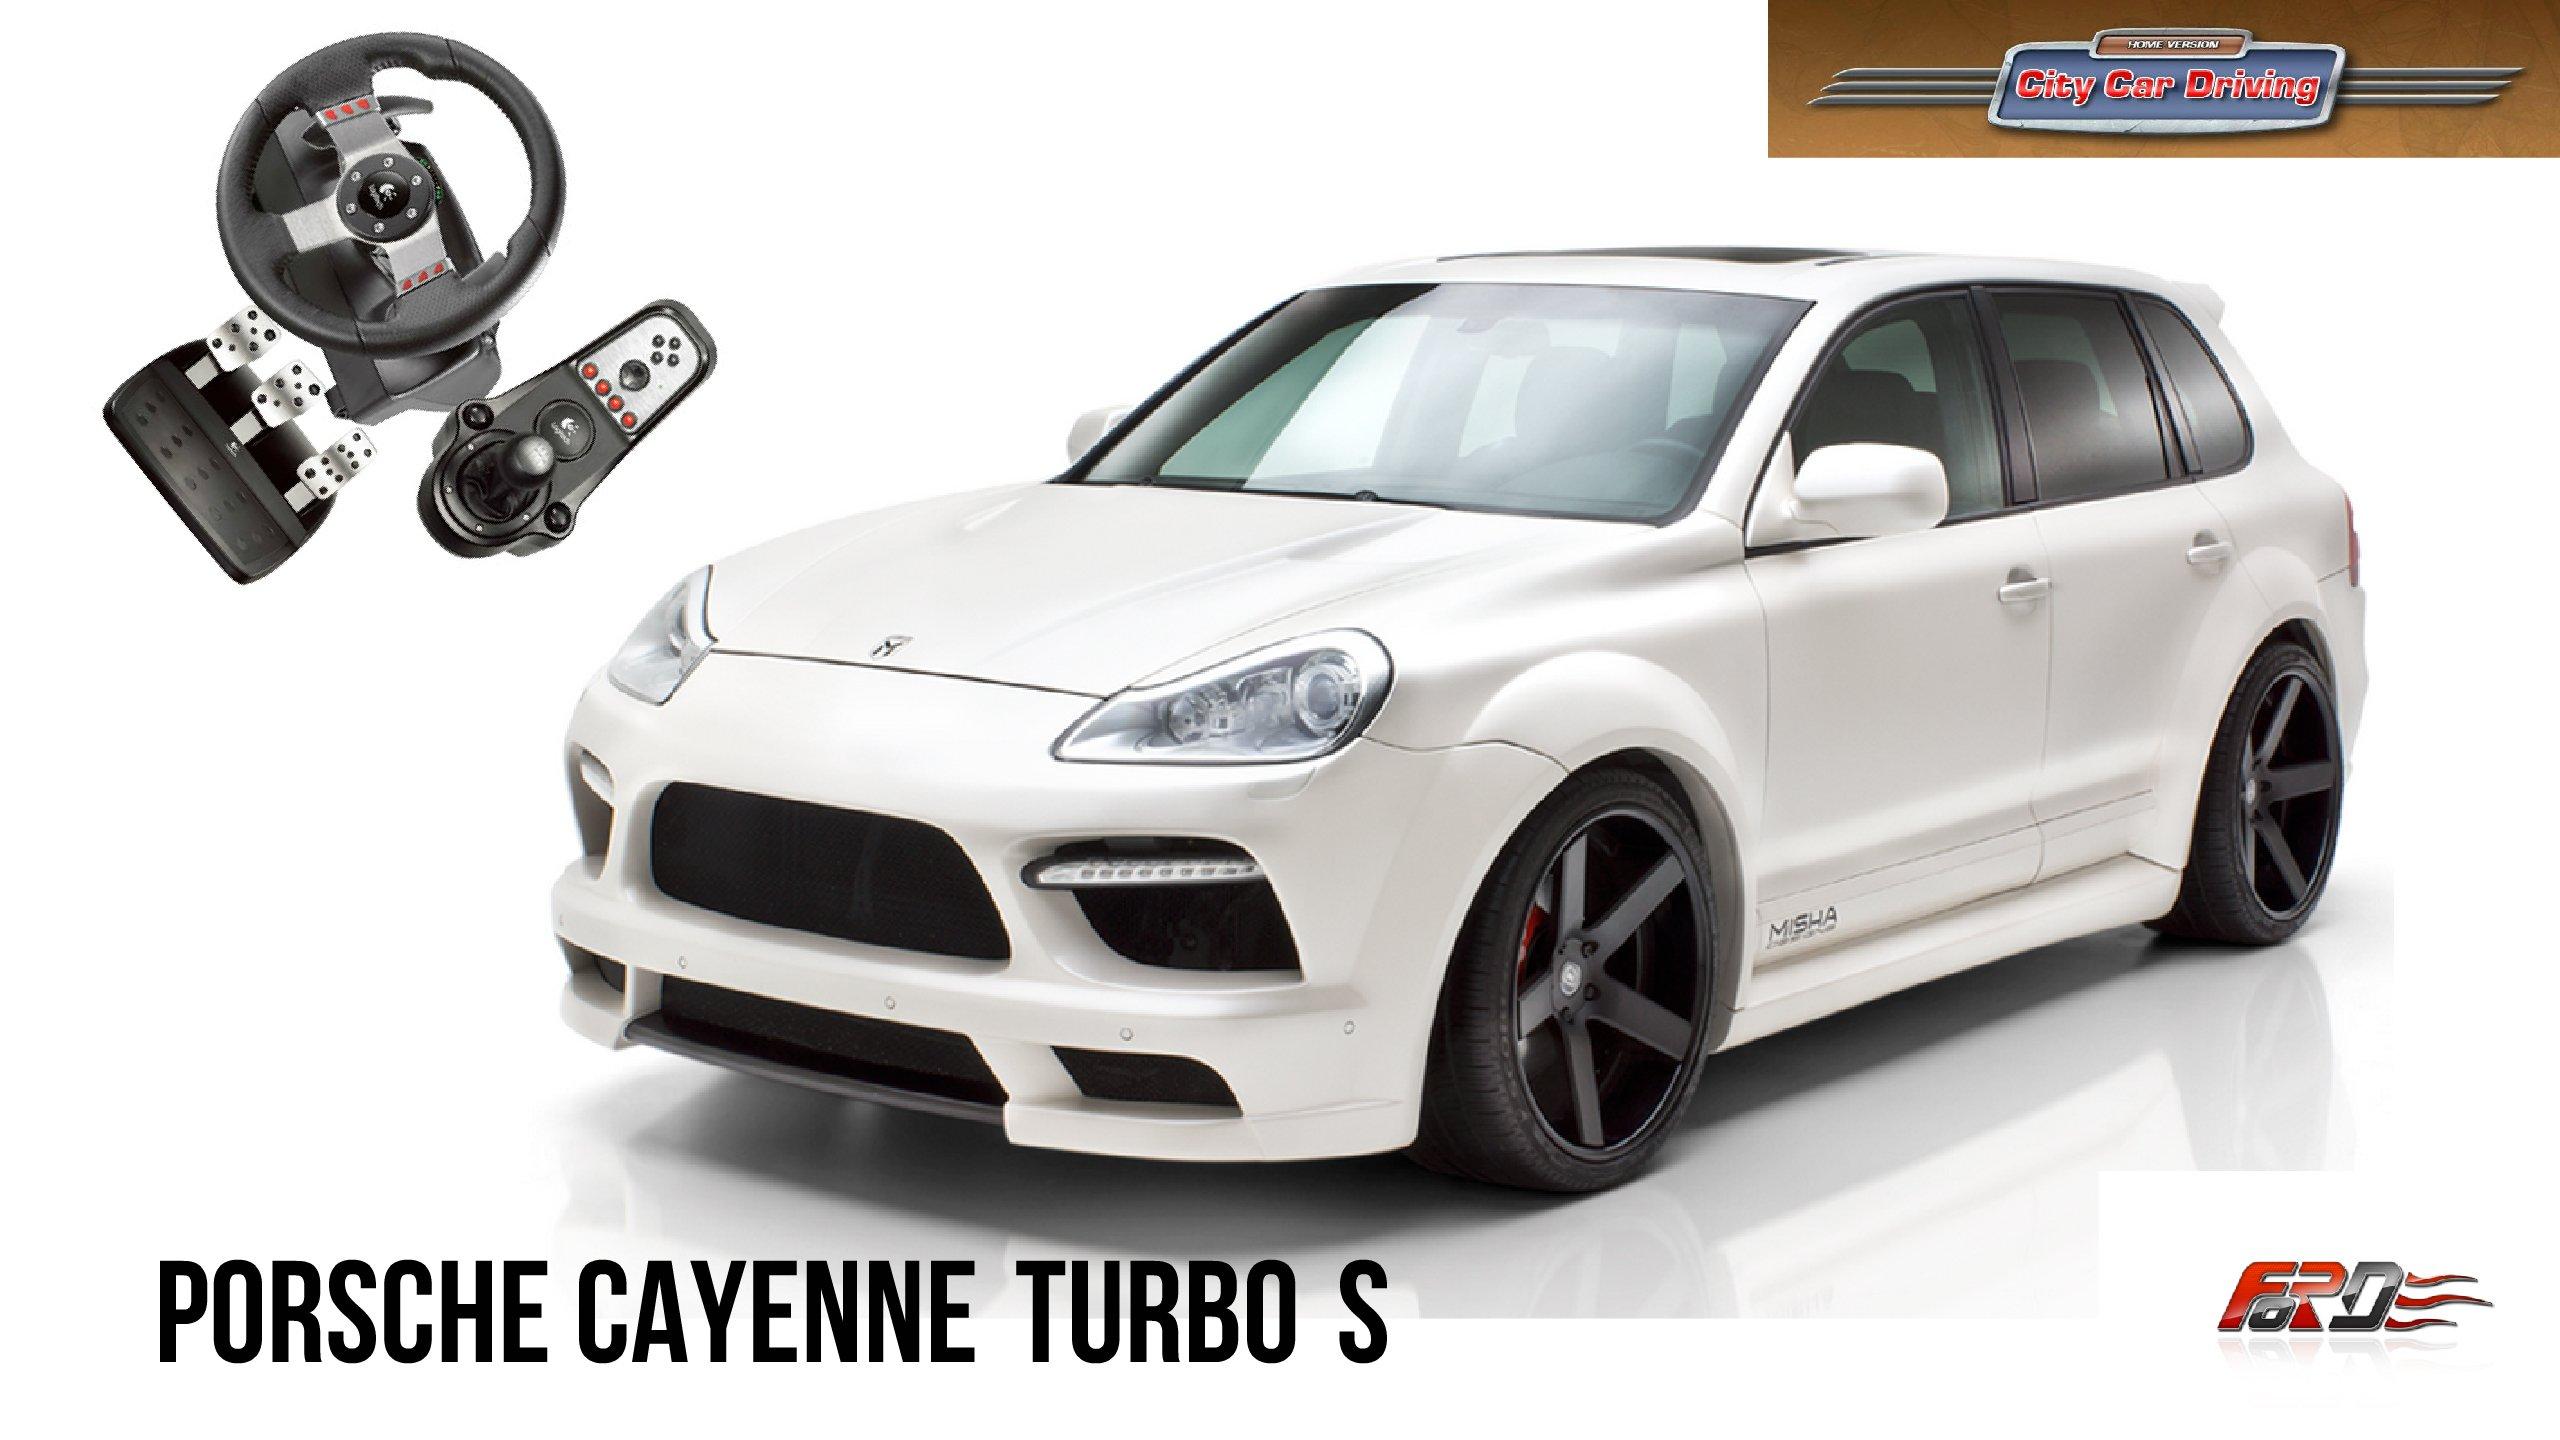 Porsche Cayenne Turbo S - тест-драйв, обзор спортивного кроссовера, зима, City Car Driving  - Изображение 1